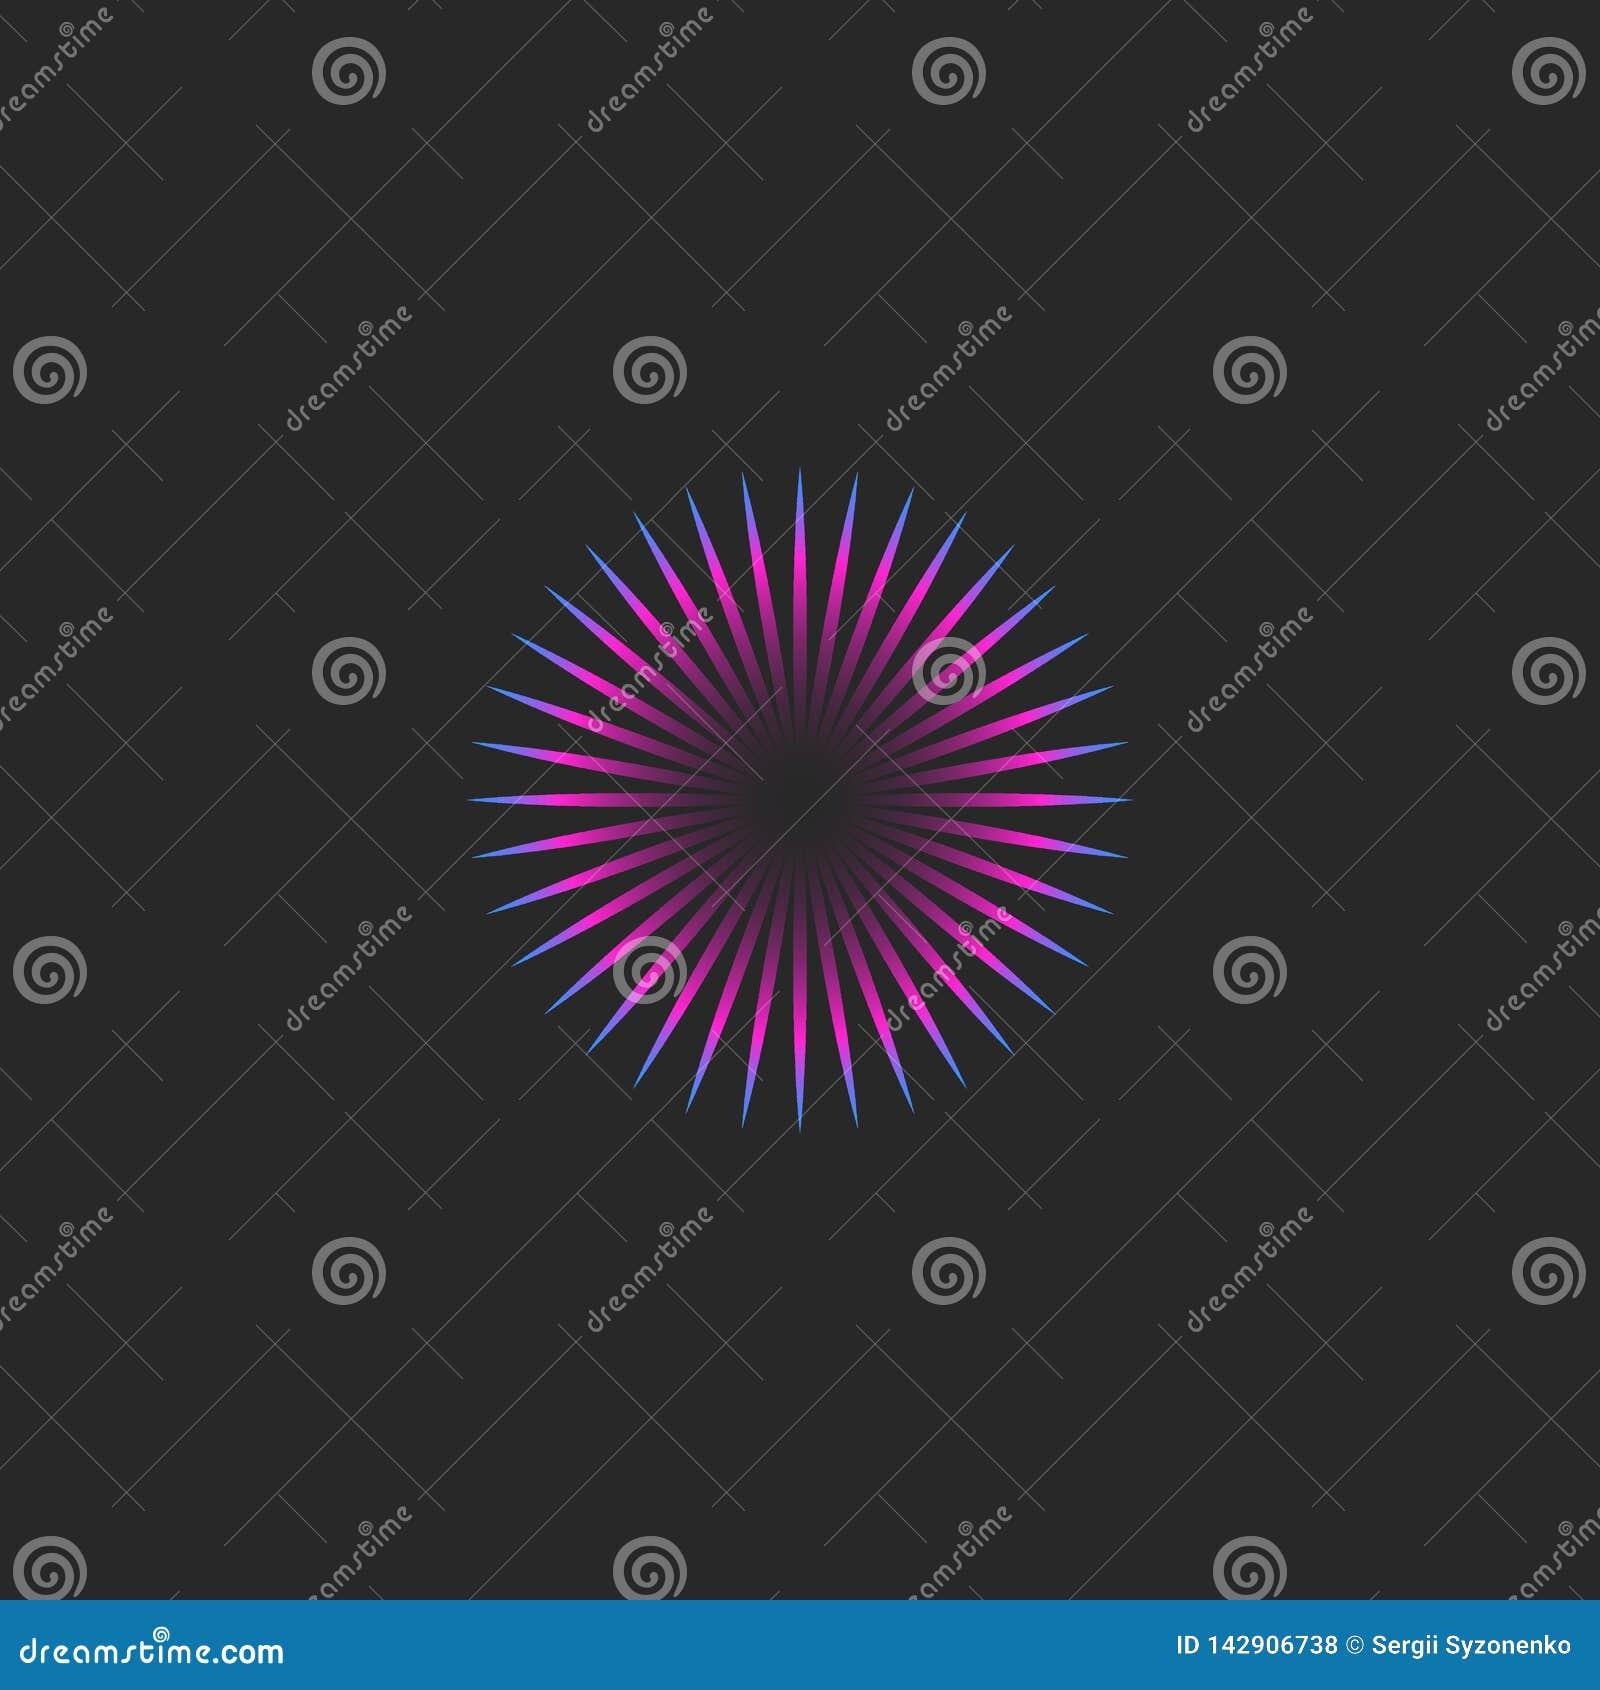 Minimalist Style Logo Round Illusion Fascinating Look Emblem